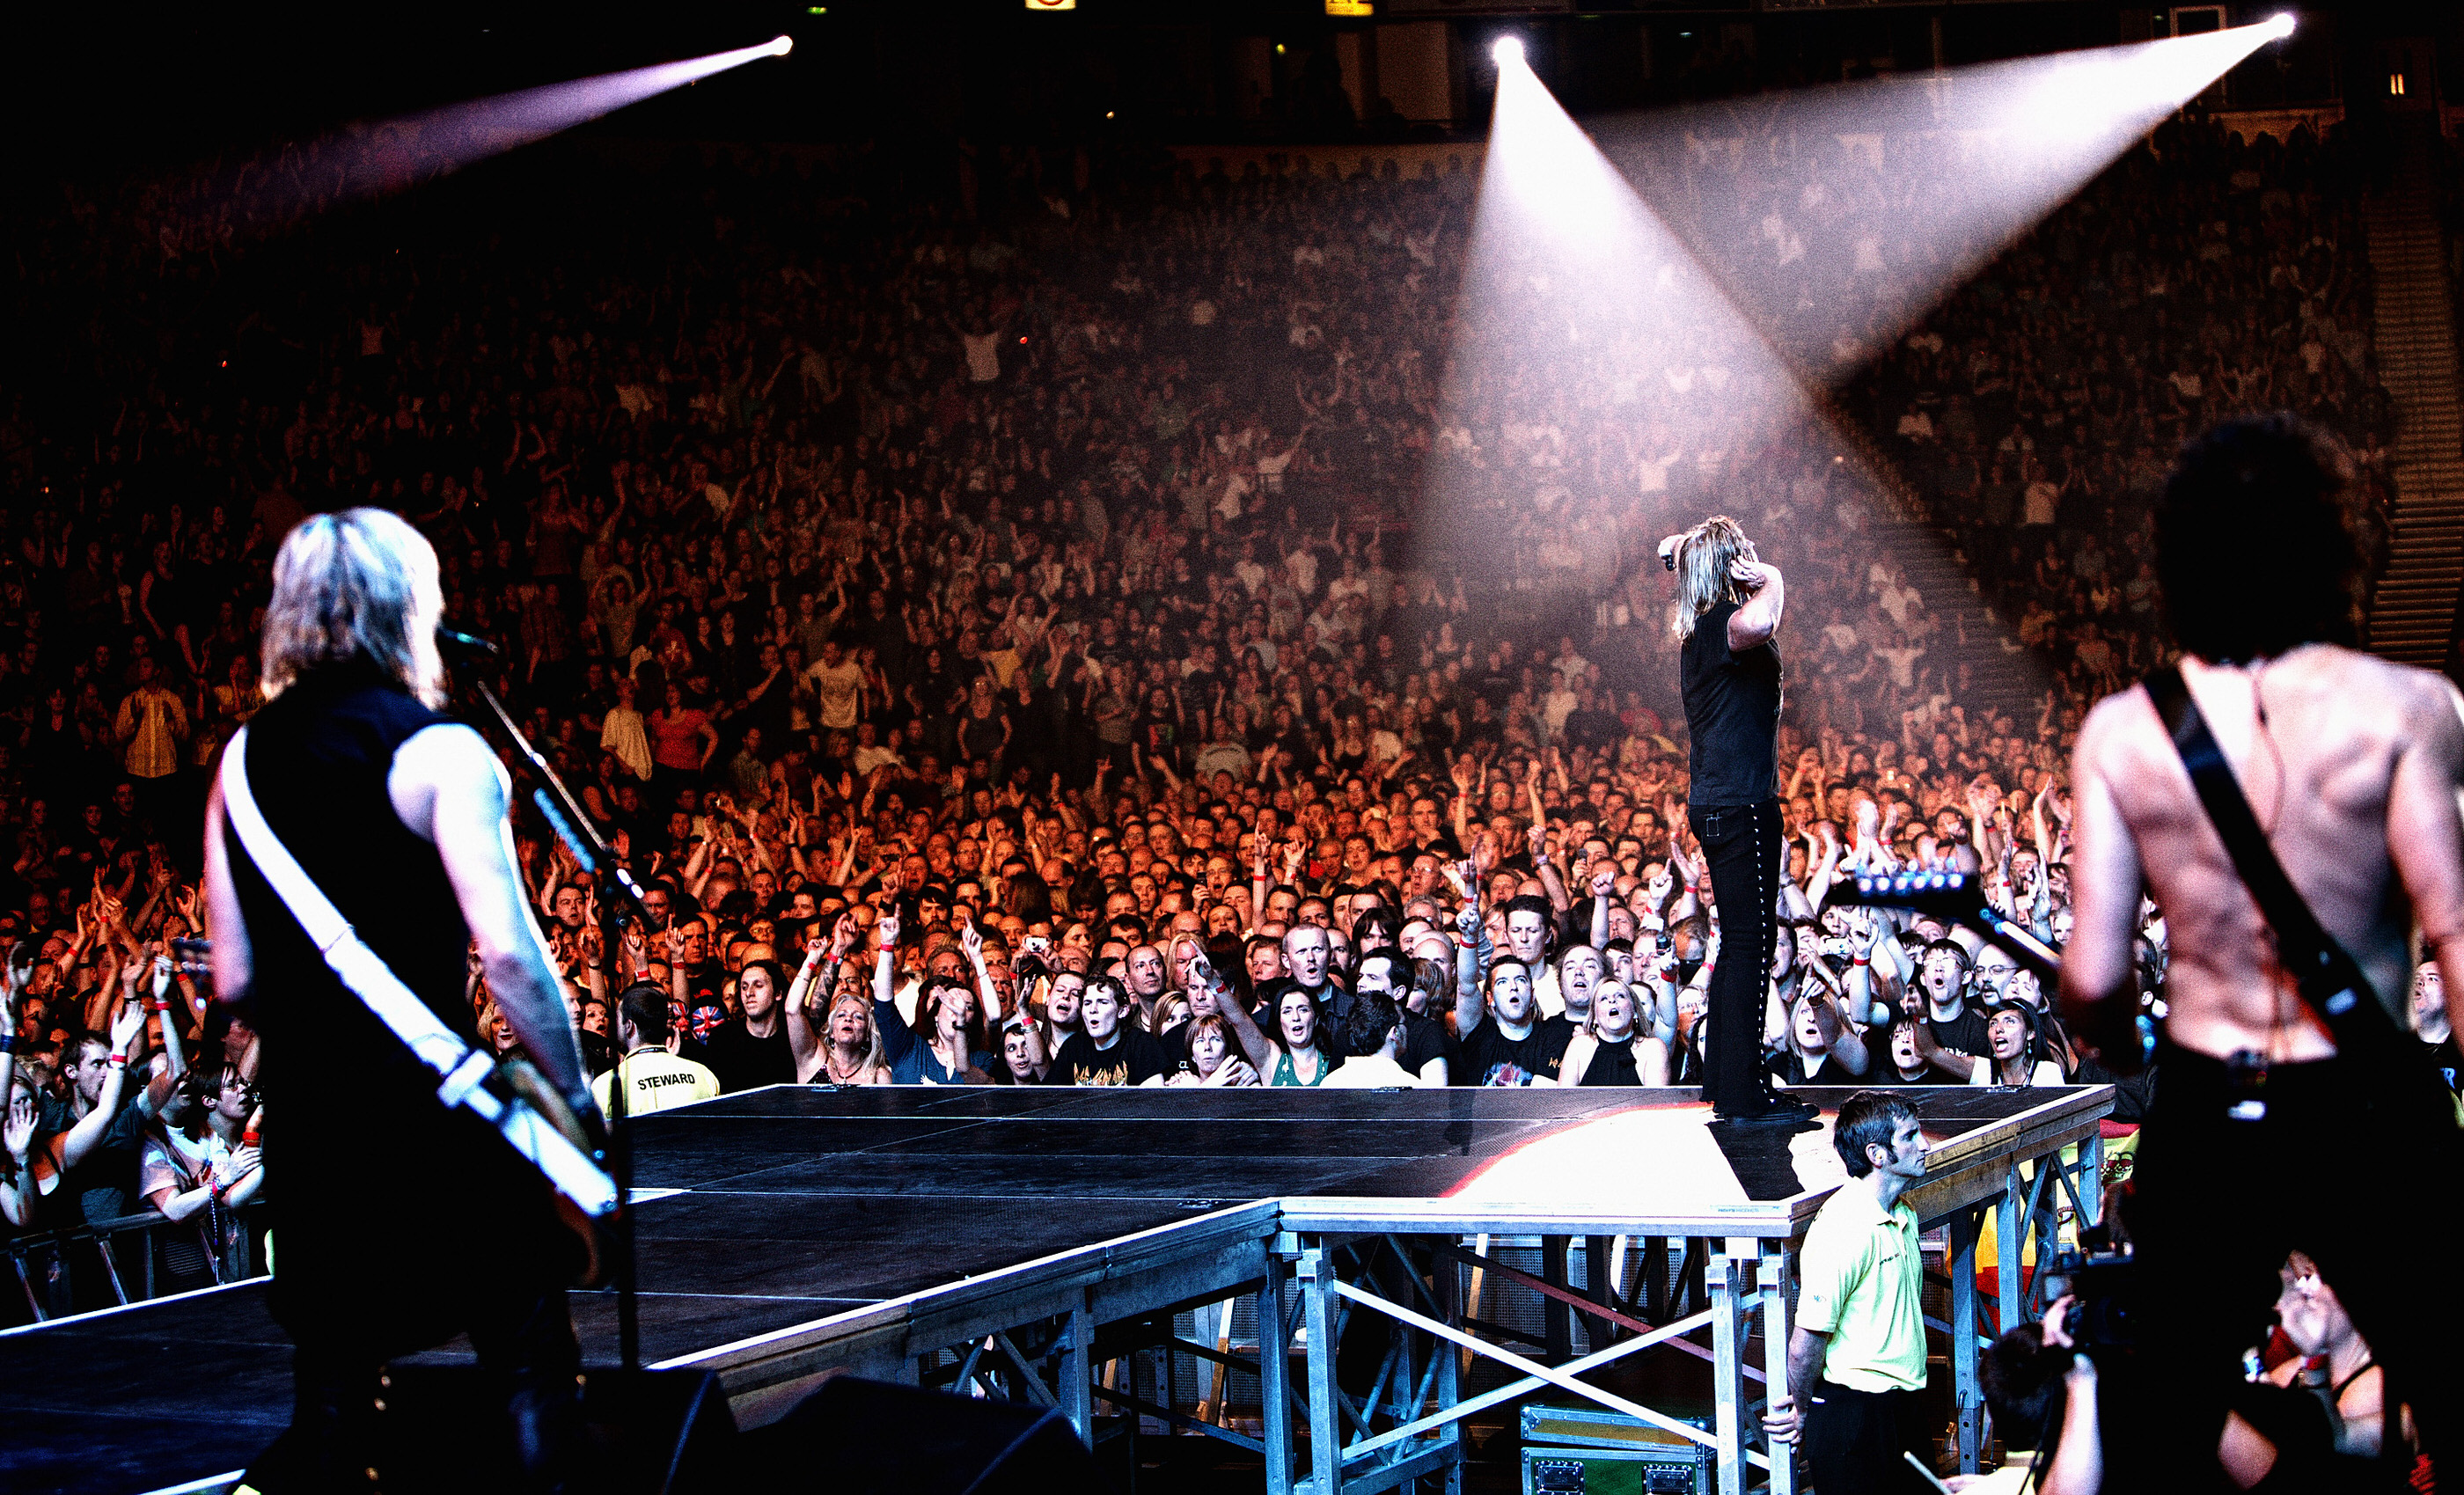 Joe Elliott Def Leppard onstage Manchester M.E.N. 2008 by Ash Ne